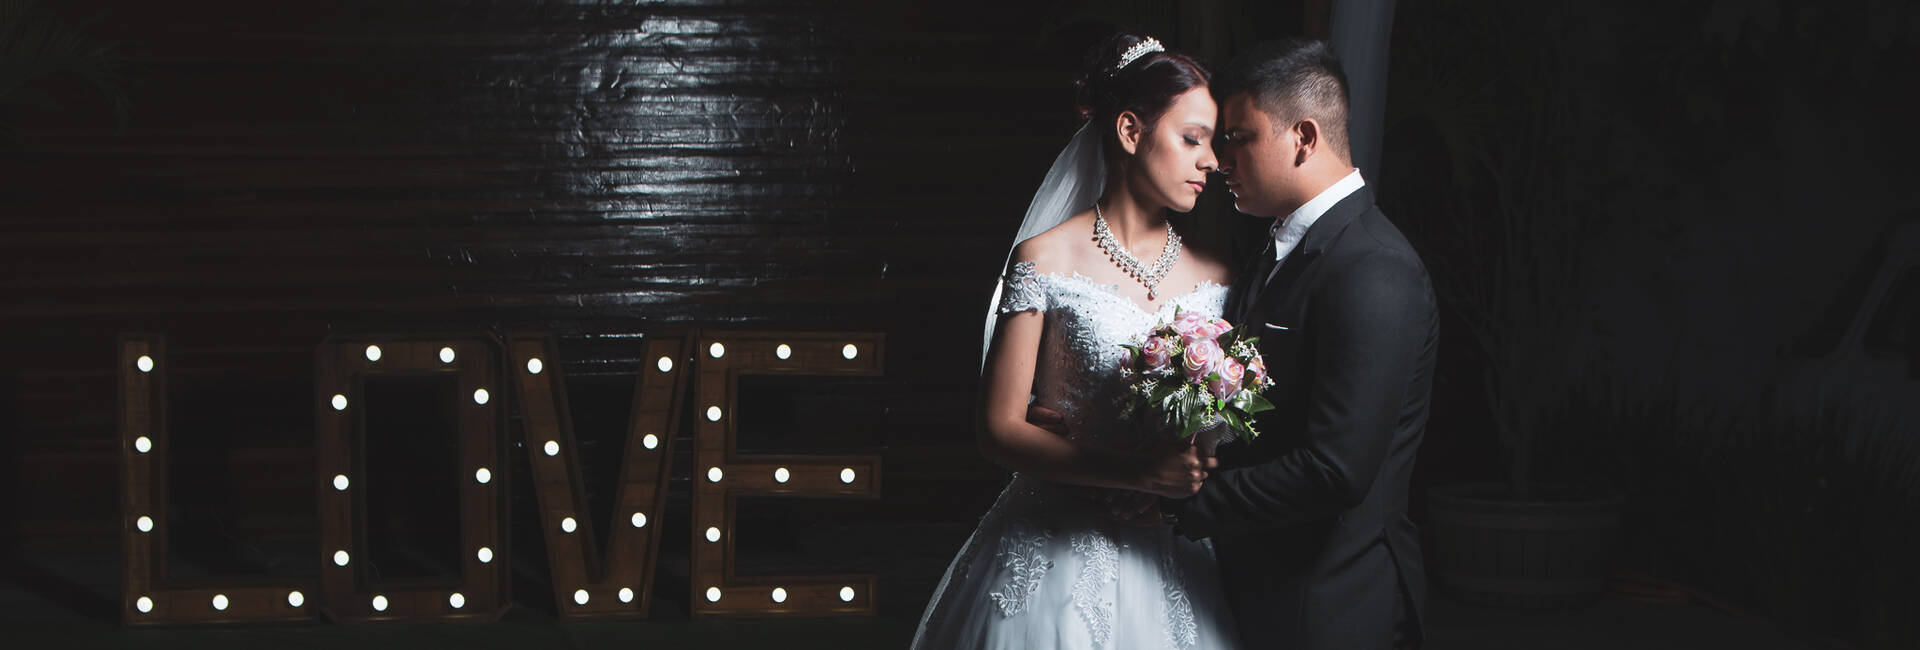 Casamentos de Ruth & Daniel